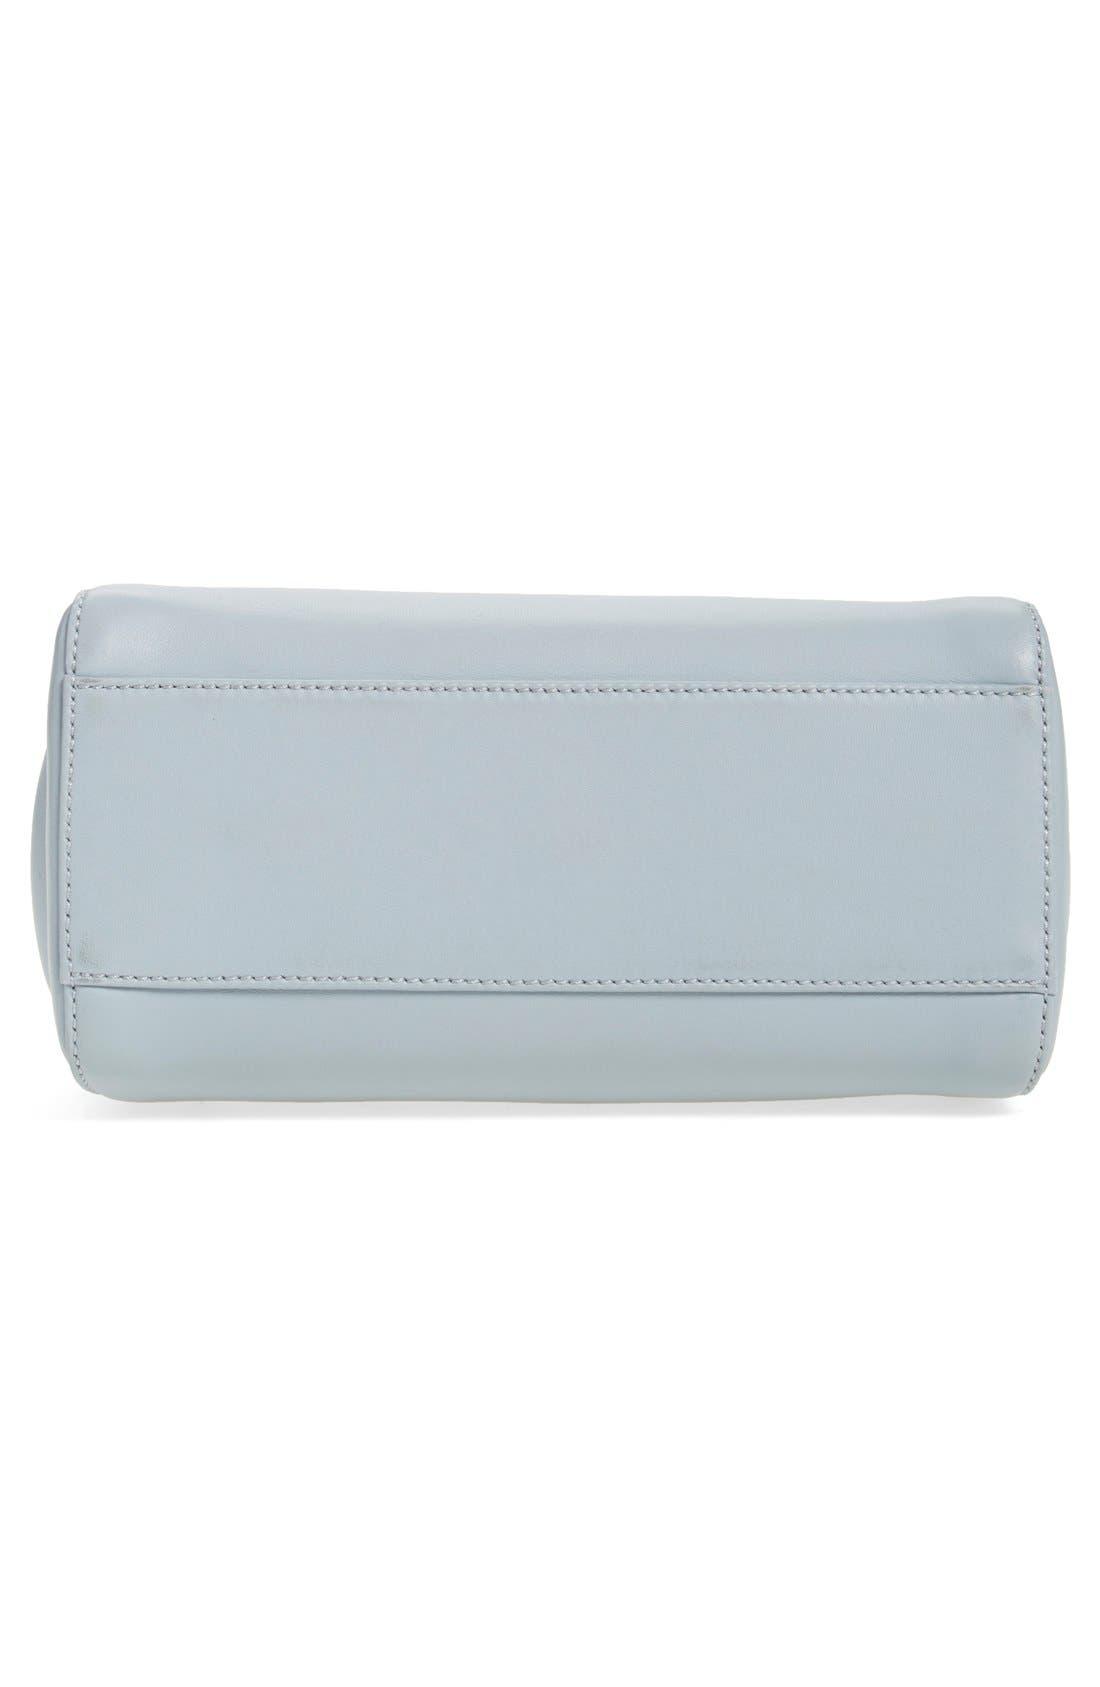 'Mini Peekaboo' Colorblock Leather Bag,                             Alternate thumbnail 2, color,                             250